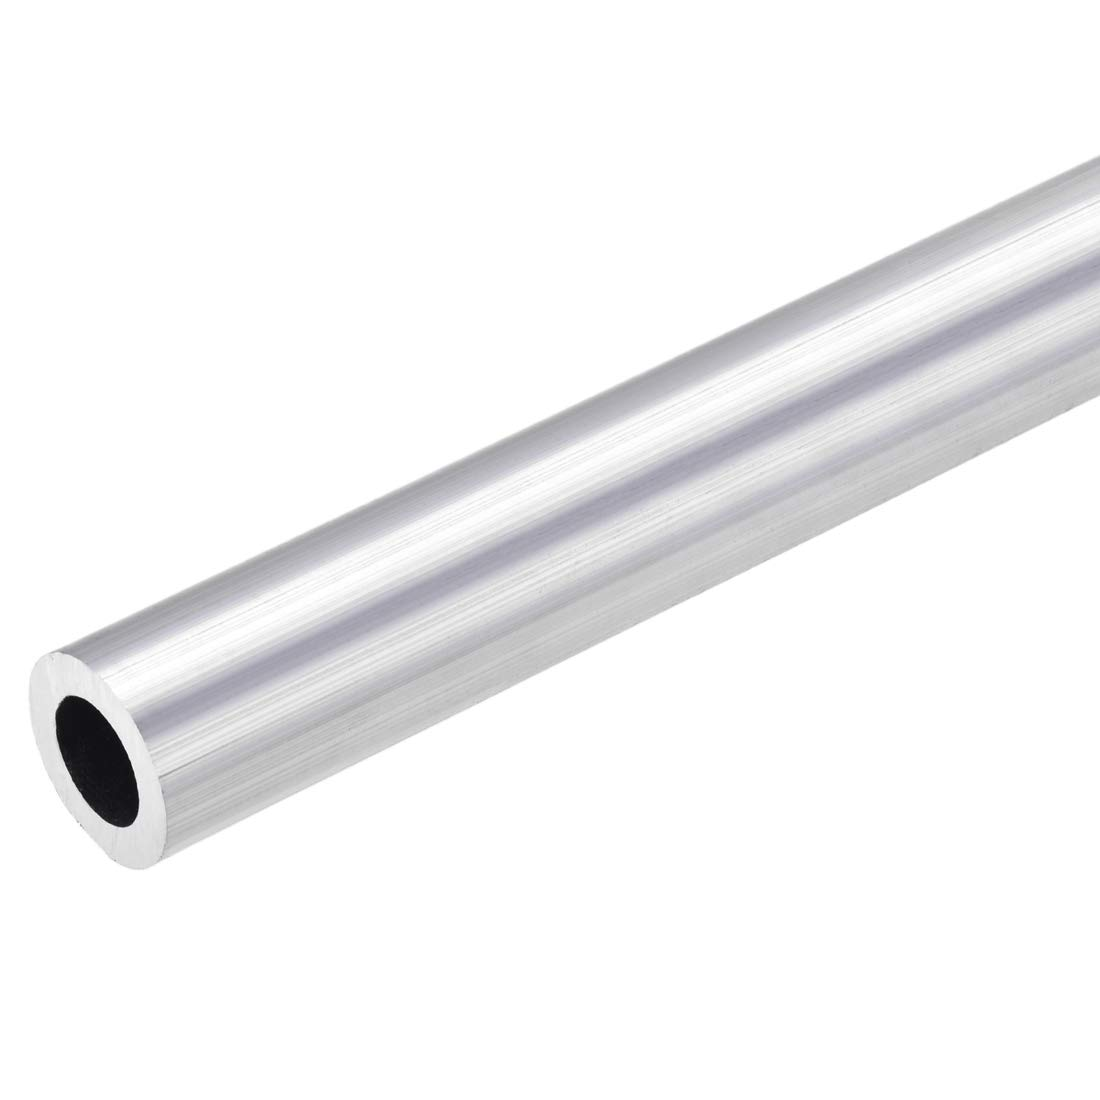 uxcell 6063 Aluminum Round Tube 23mm OD 14mm Inner Dia 300mm Length Seamless Straight Tubing